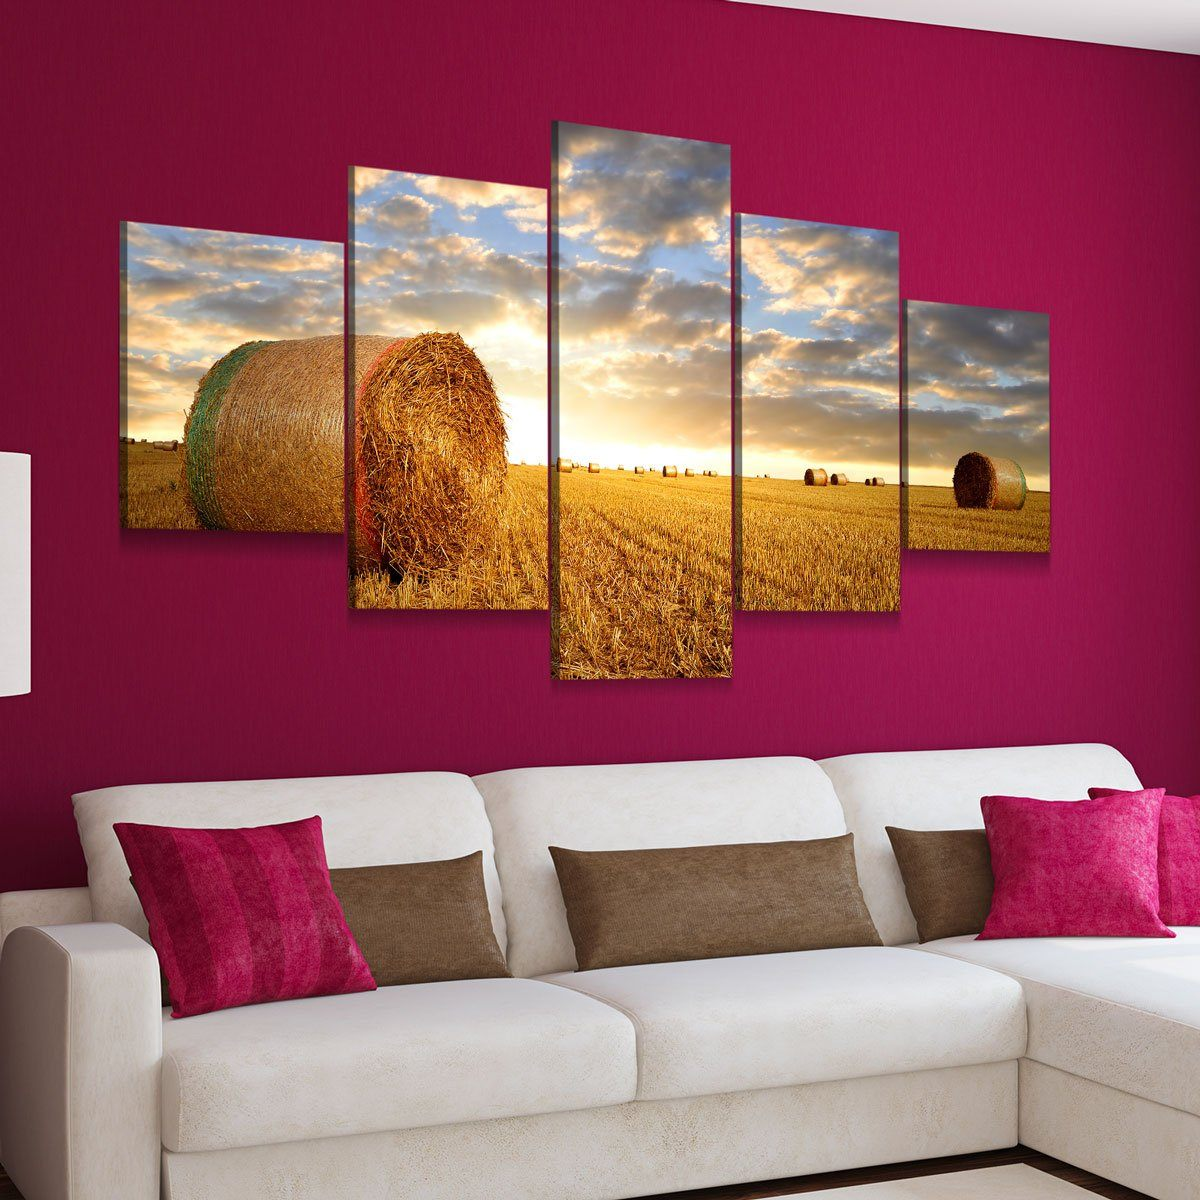 Farming Fields 5 panel canvas wall art